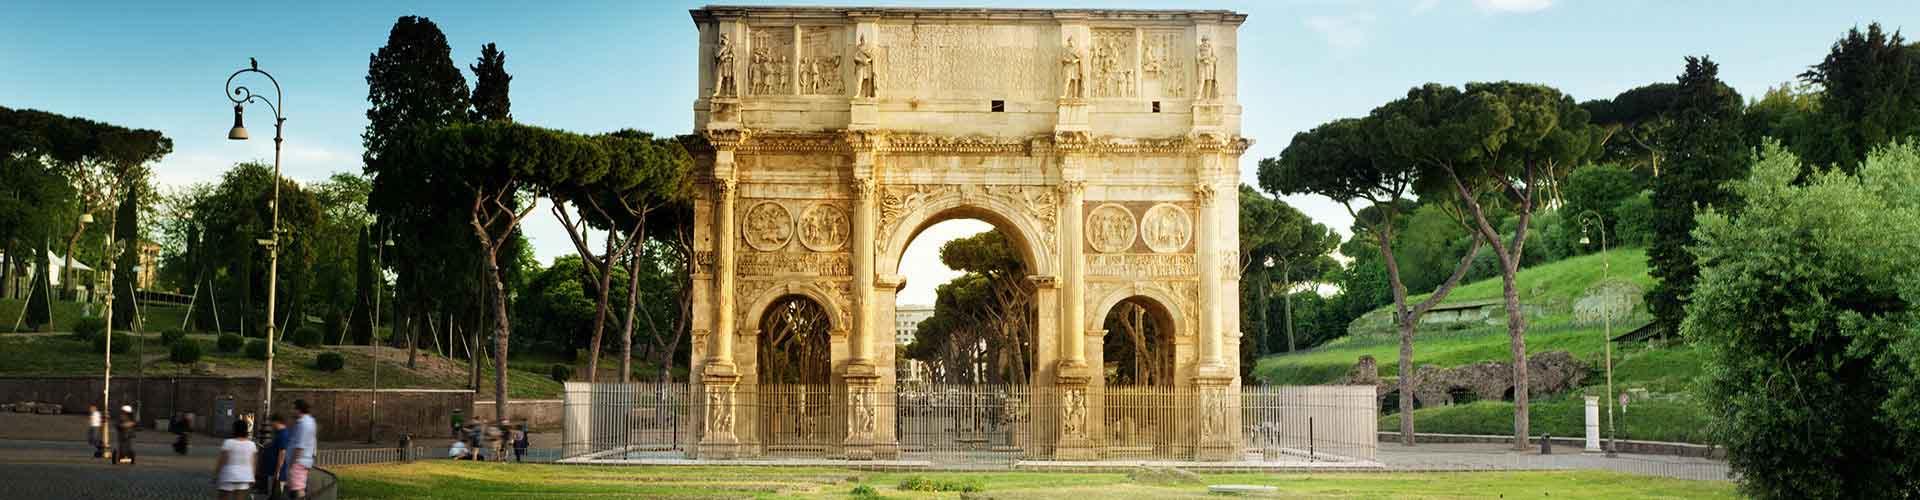 Roma - Hostales cerca a Arco de Constantino. Mapas de Roma, Fotos y comentarios de cada Hostal en Roma.